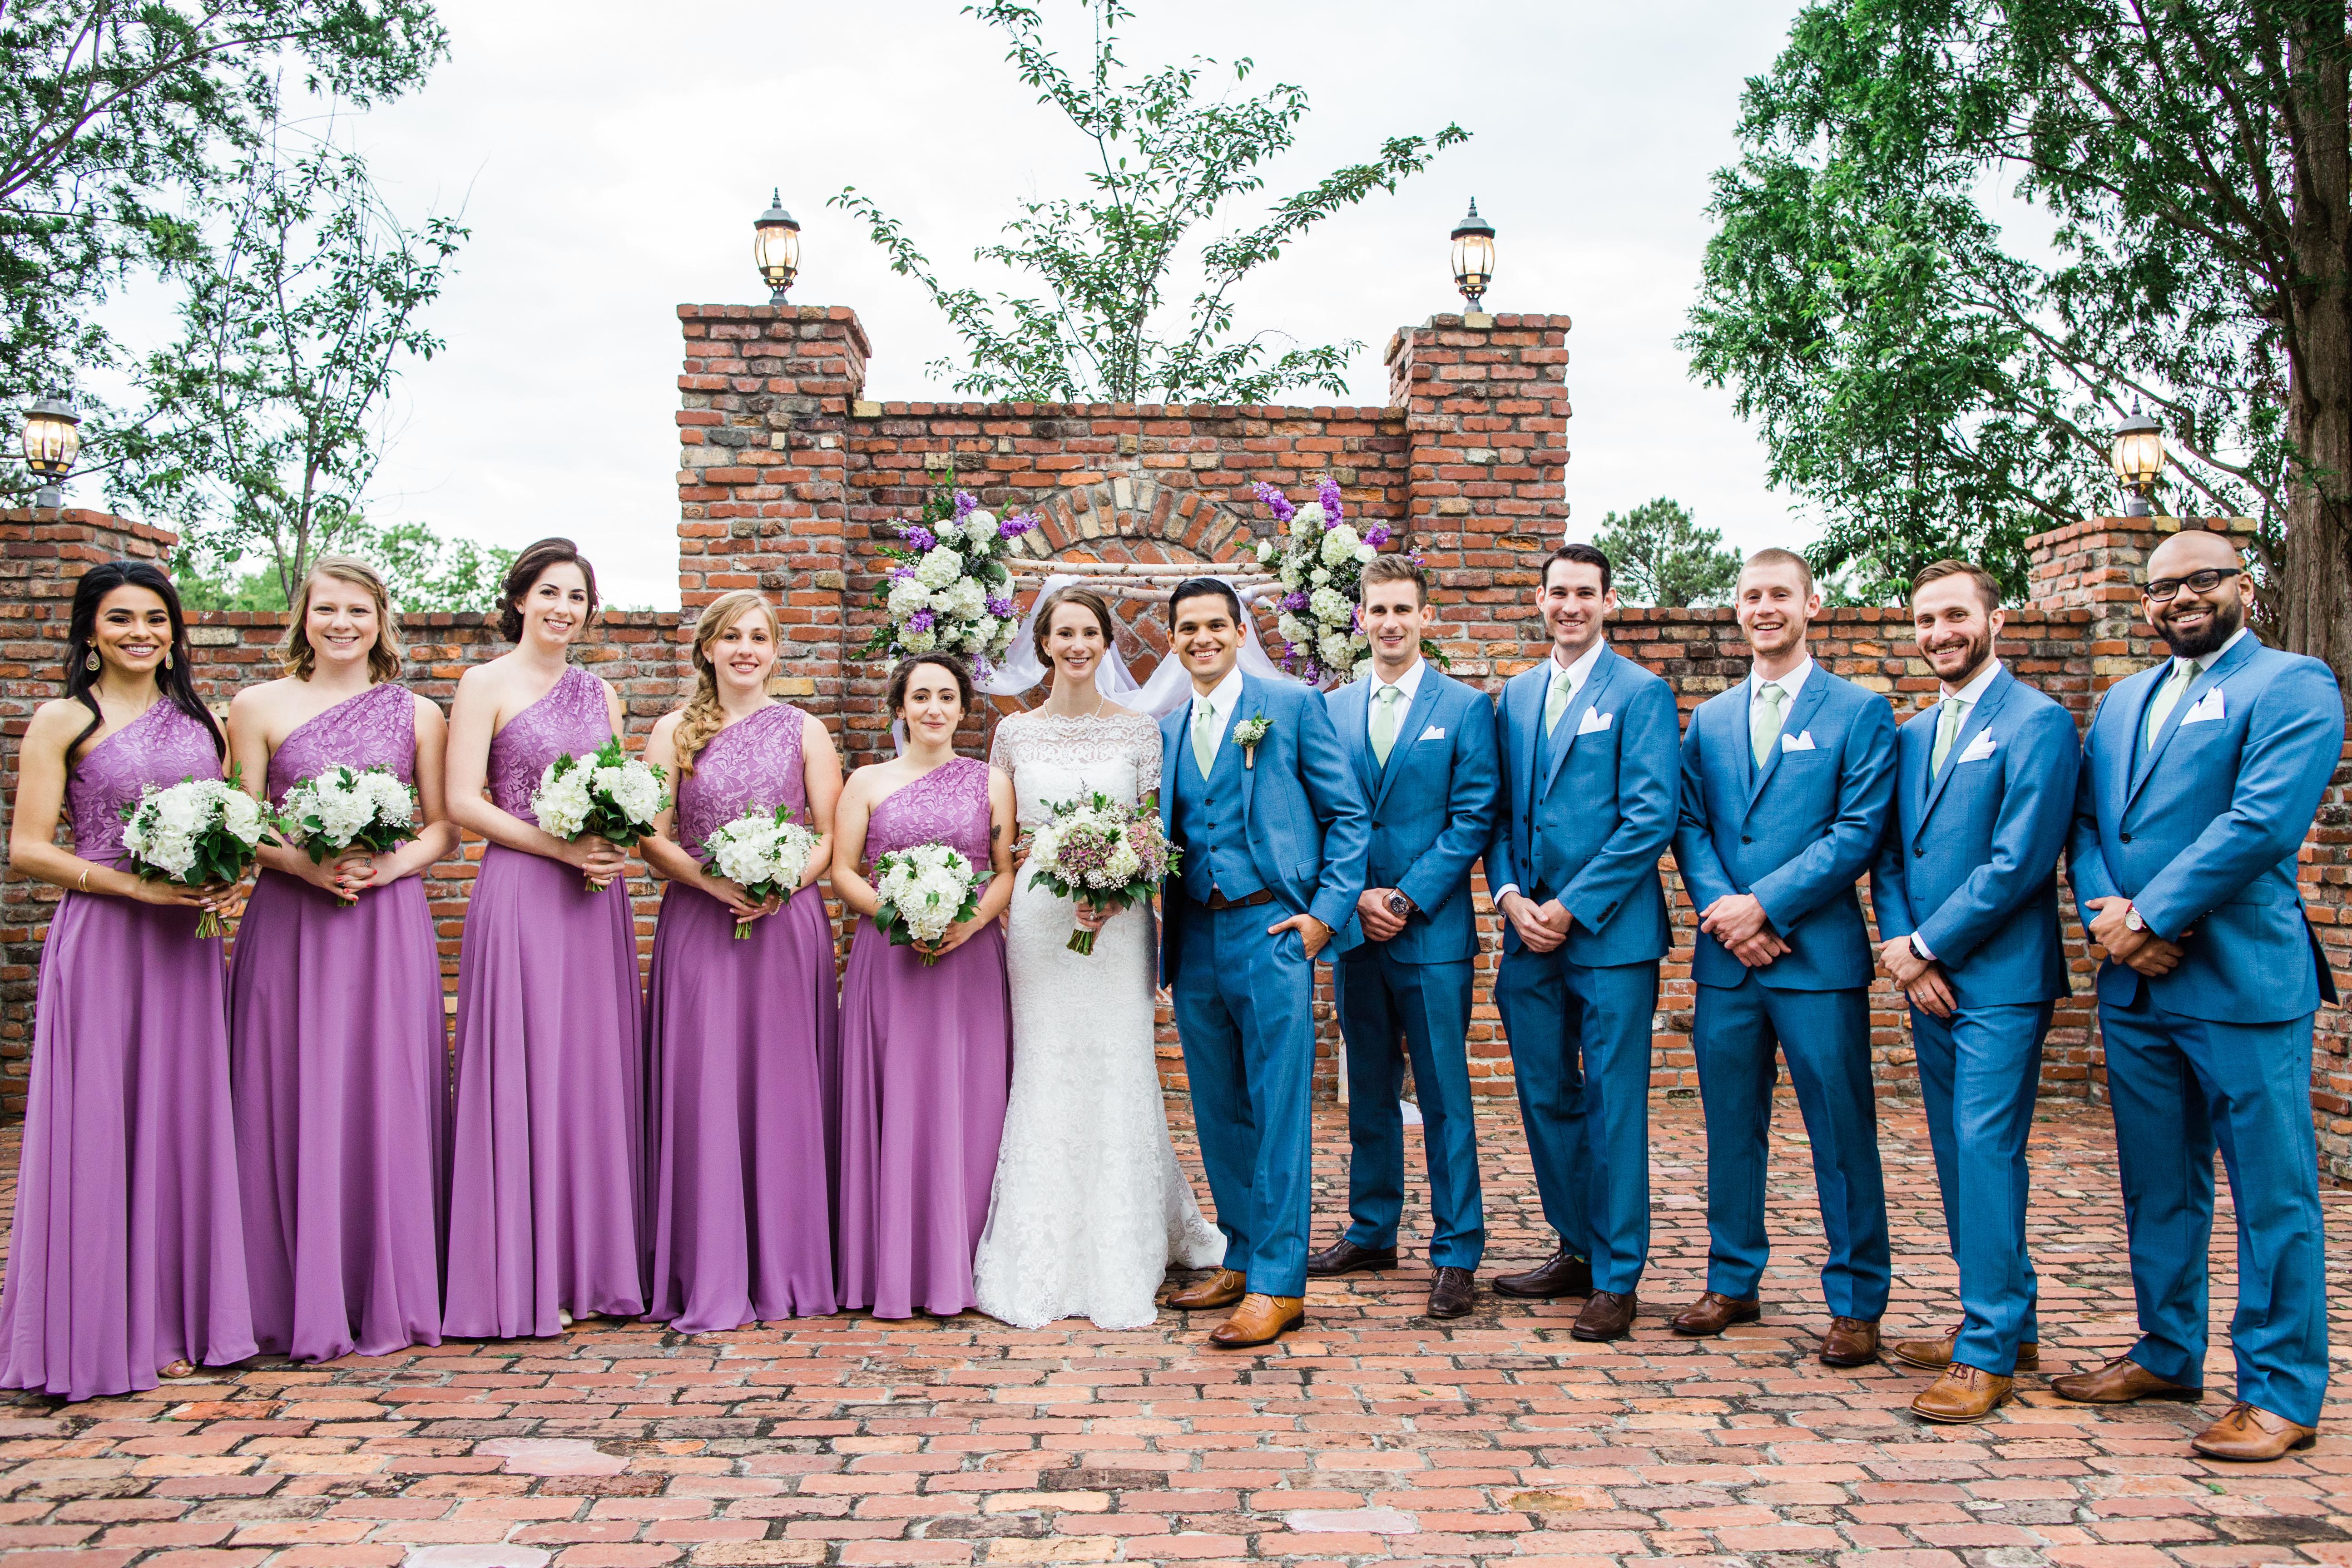 Asterisk Photo_Glaccum Wedding Preview-15